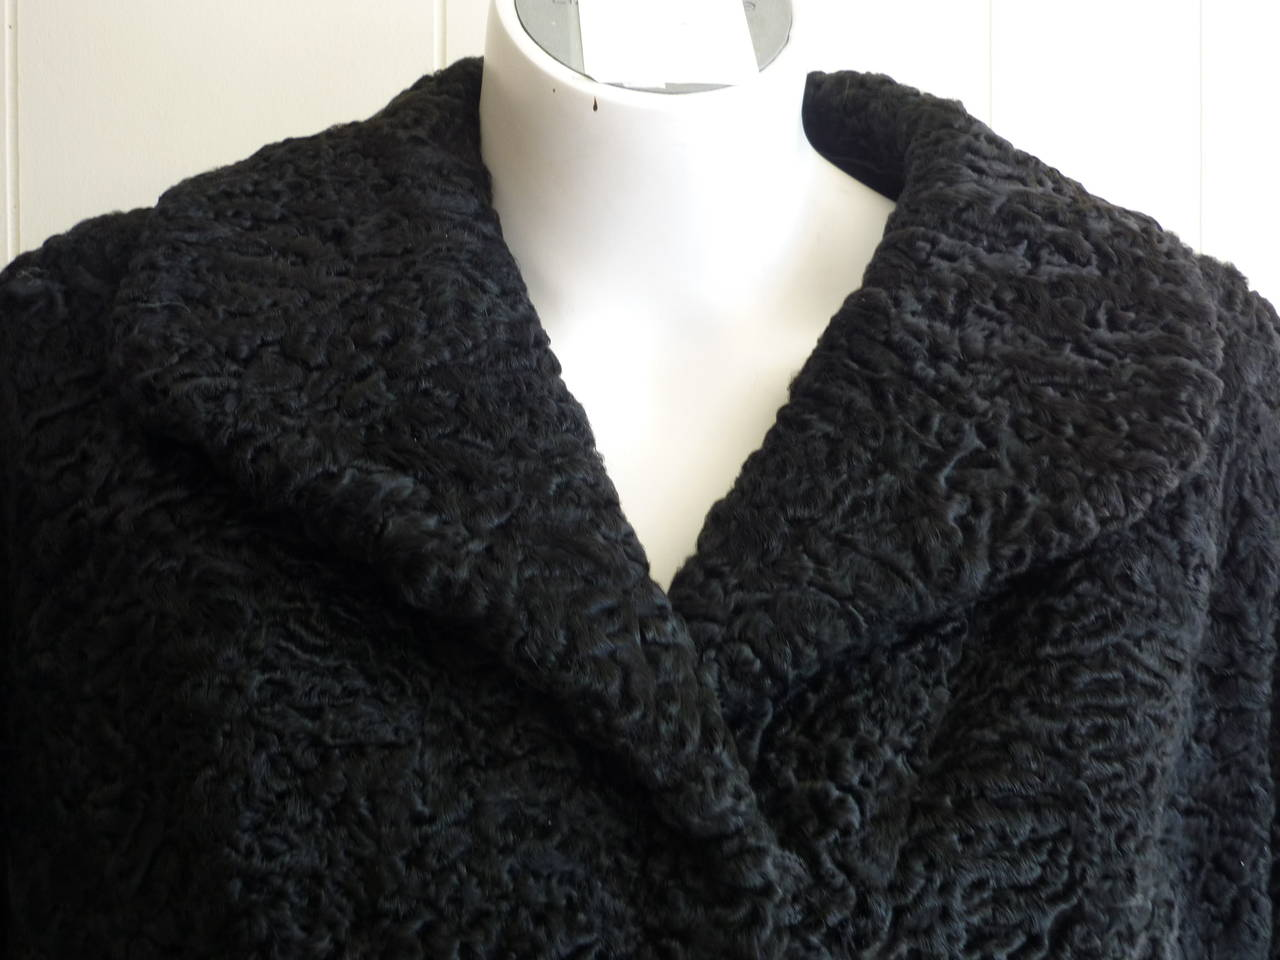 Women's 1940s - 50s Black Persian Lamb Jacket 6-8